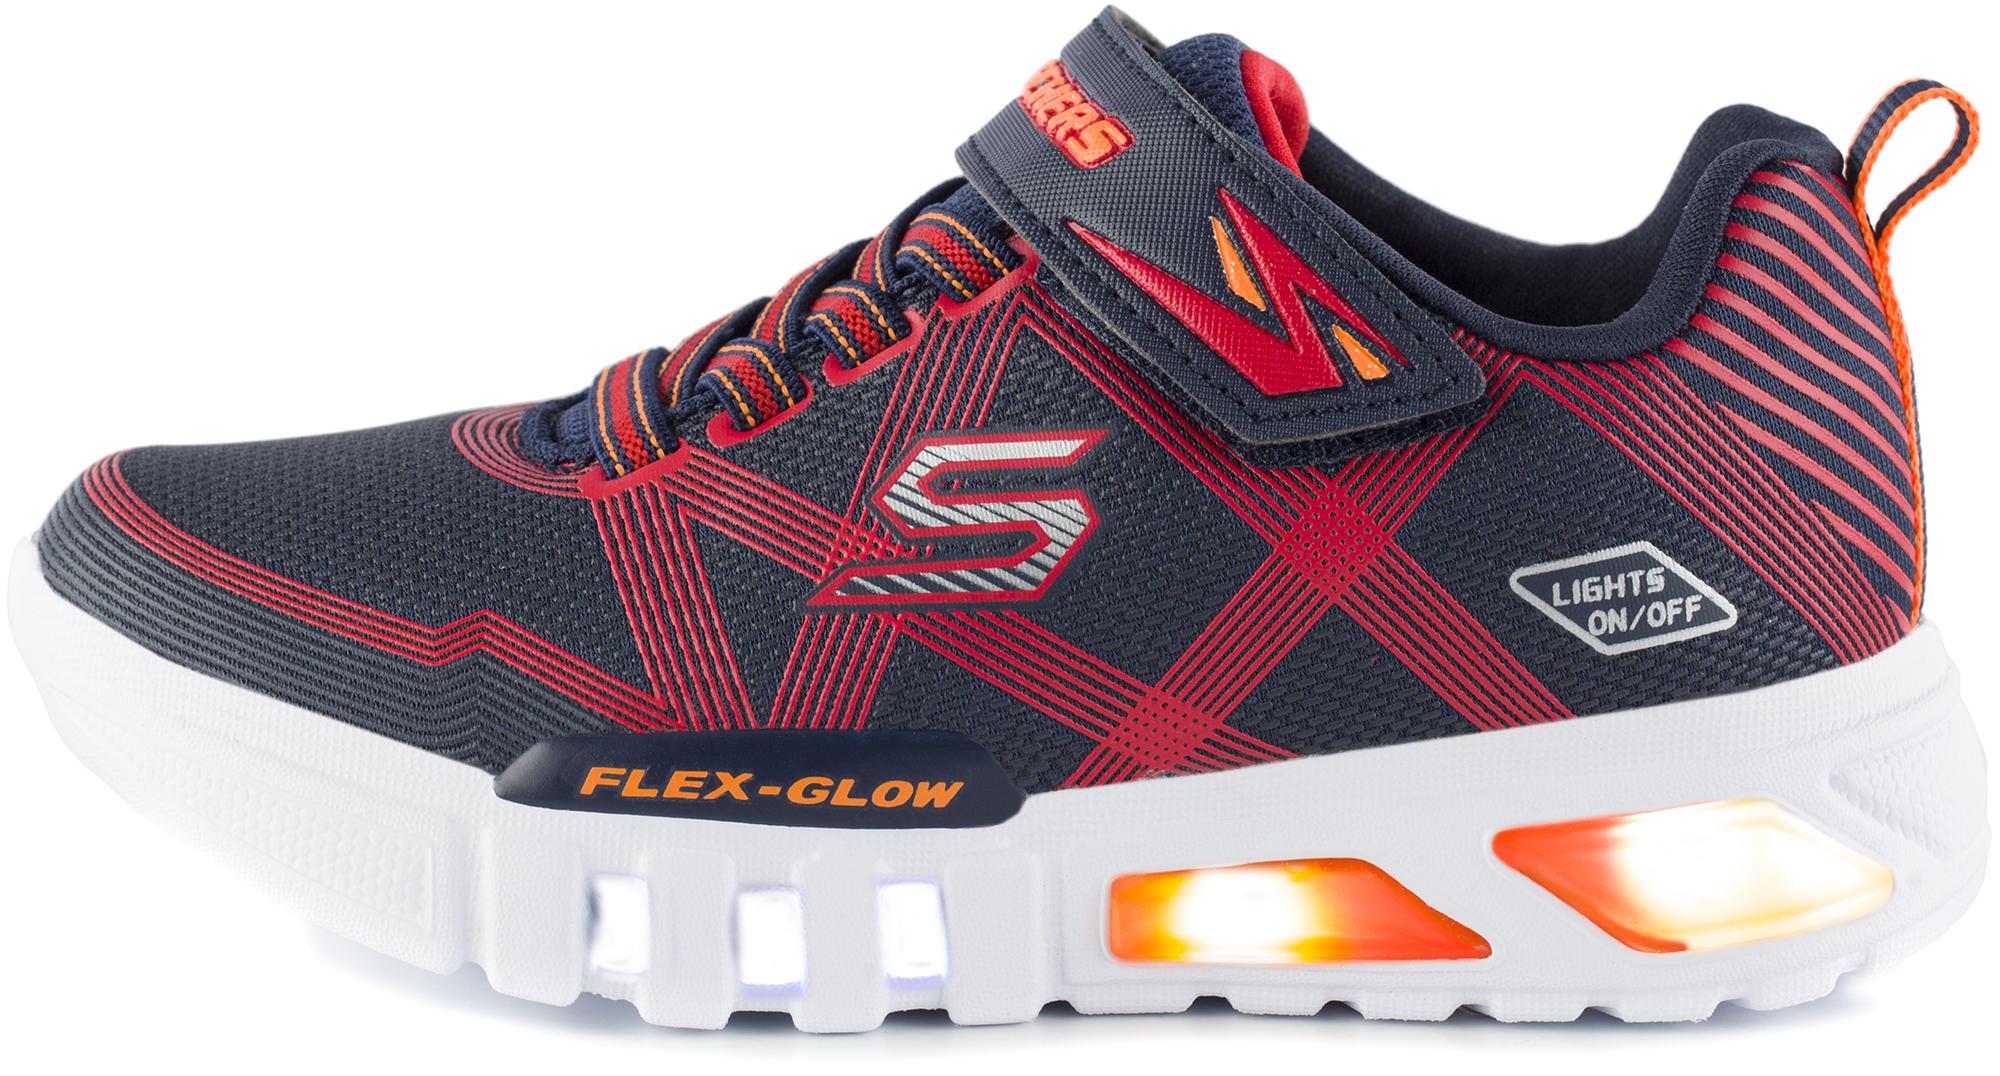 Skechers Кроссовки для мальчиков Skechers Flex-Glow, размер 32